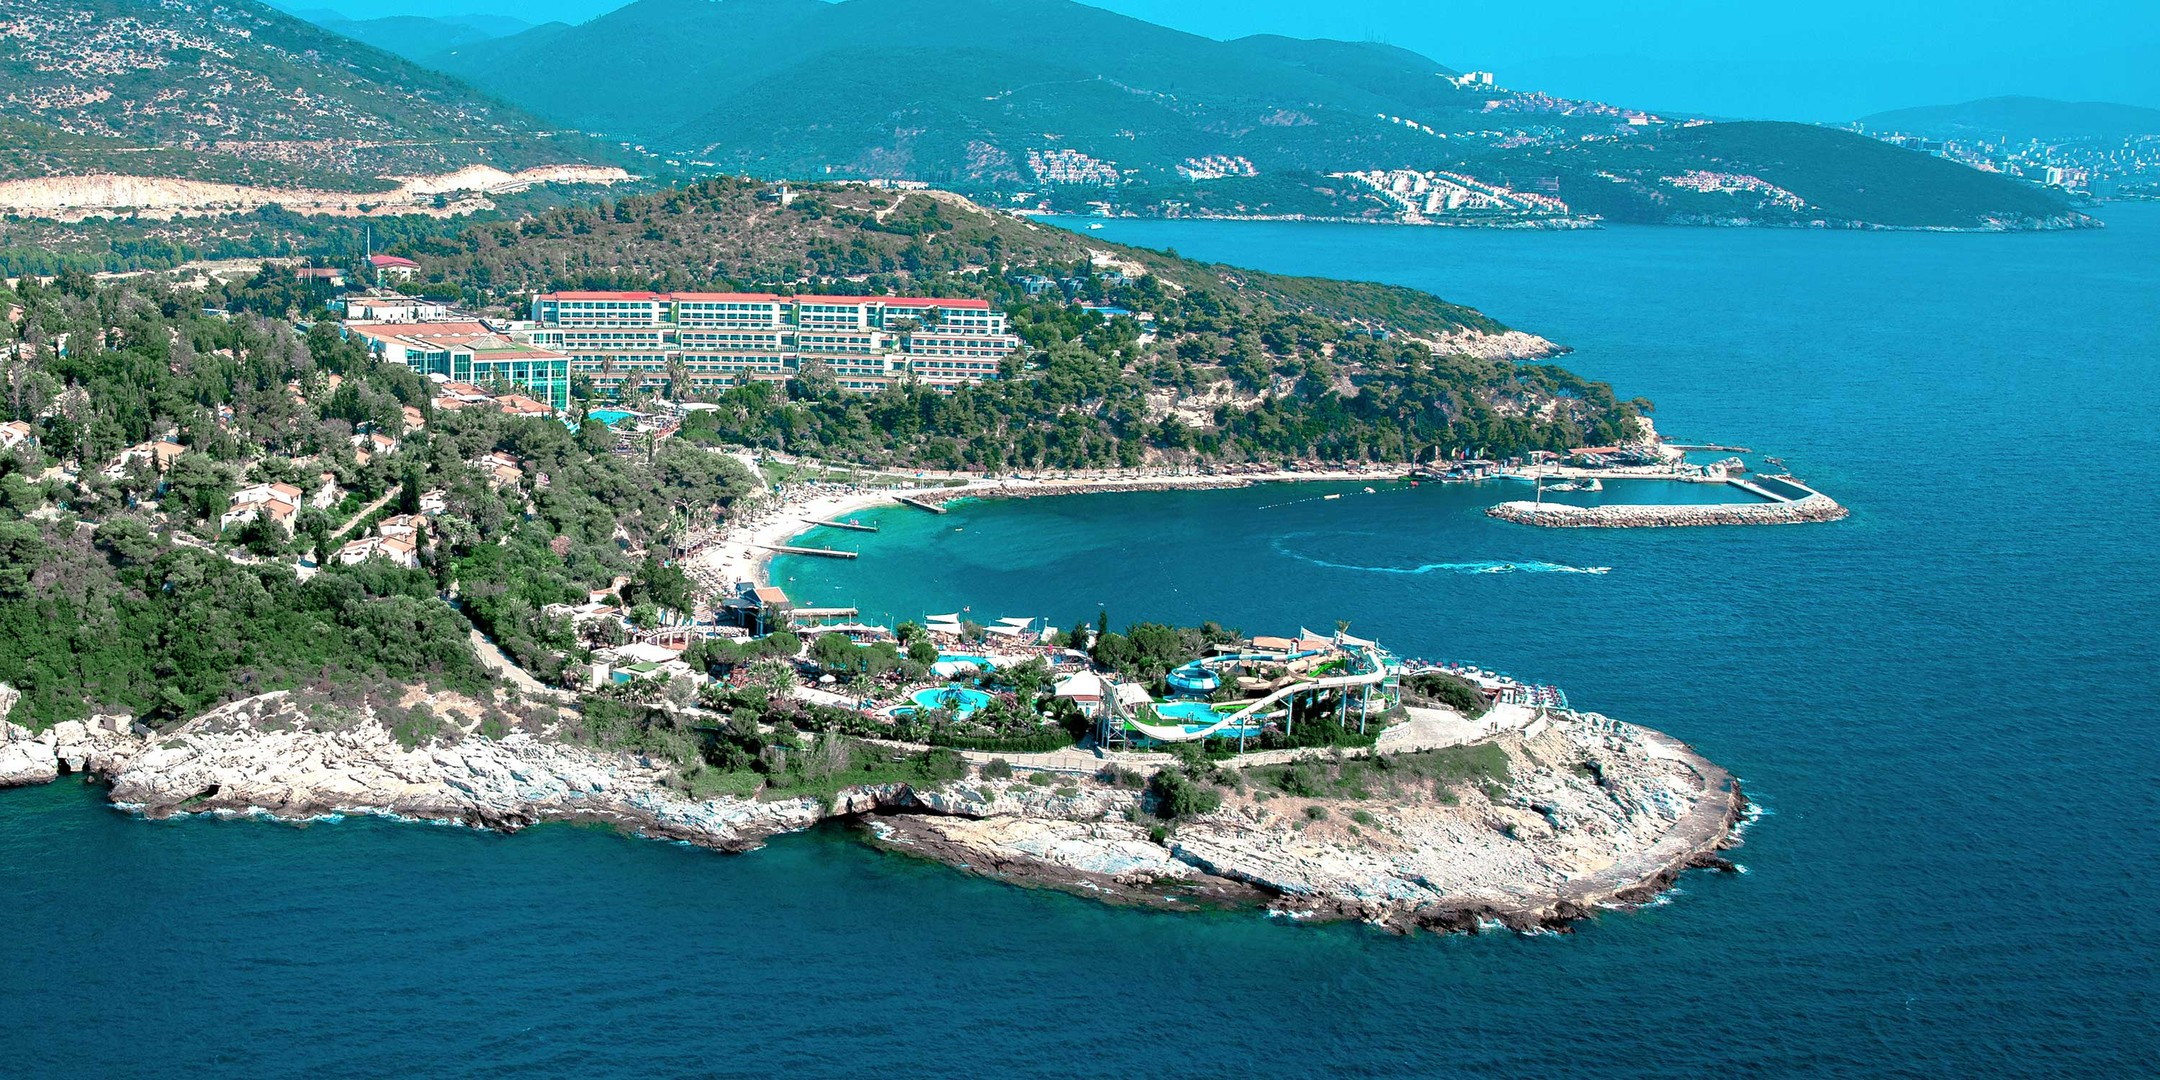 Hotel Pine Bay Holiday Resort #2